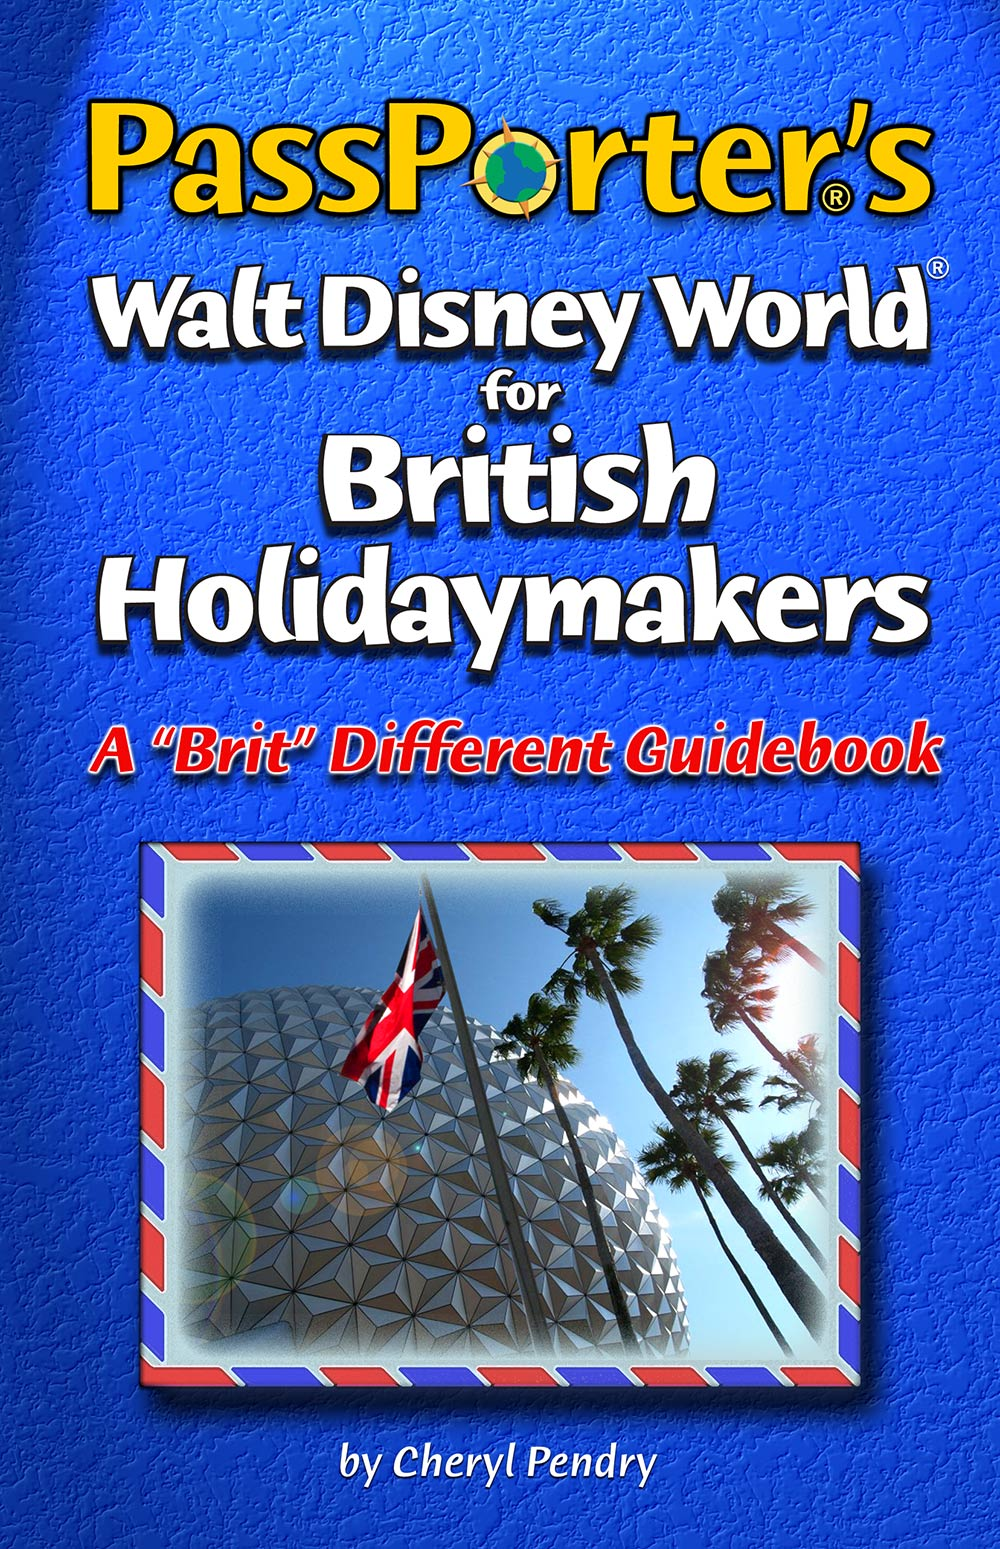 Walt Disney World for British Holidaymakers